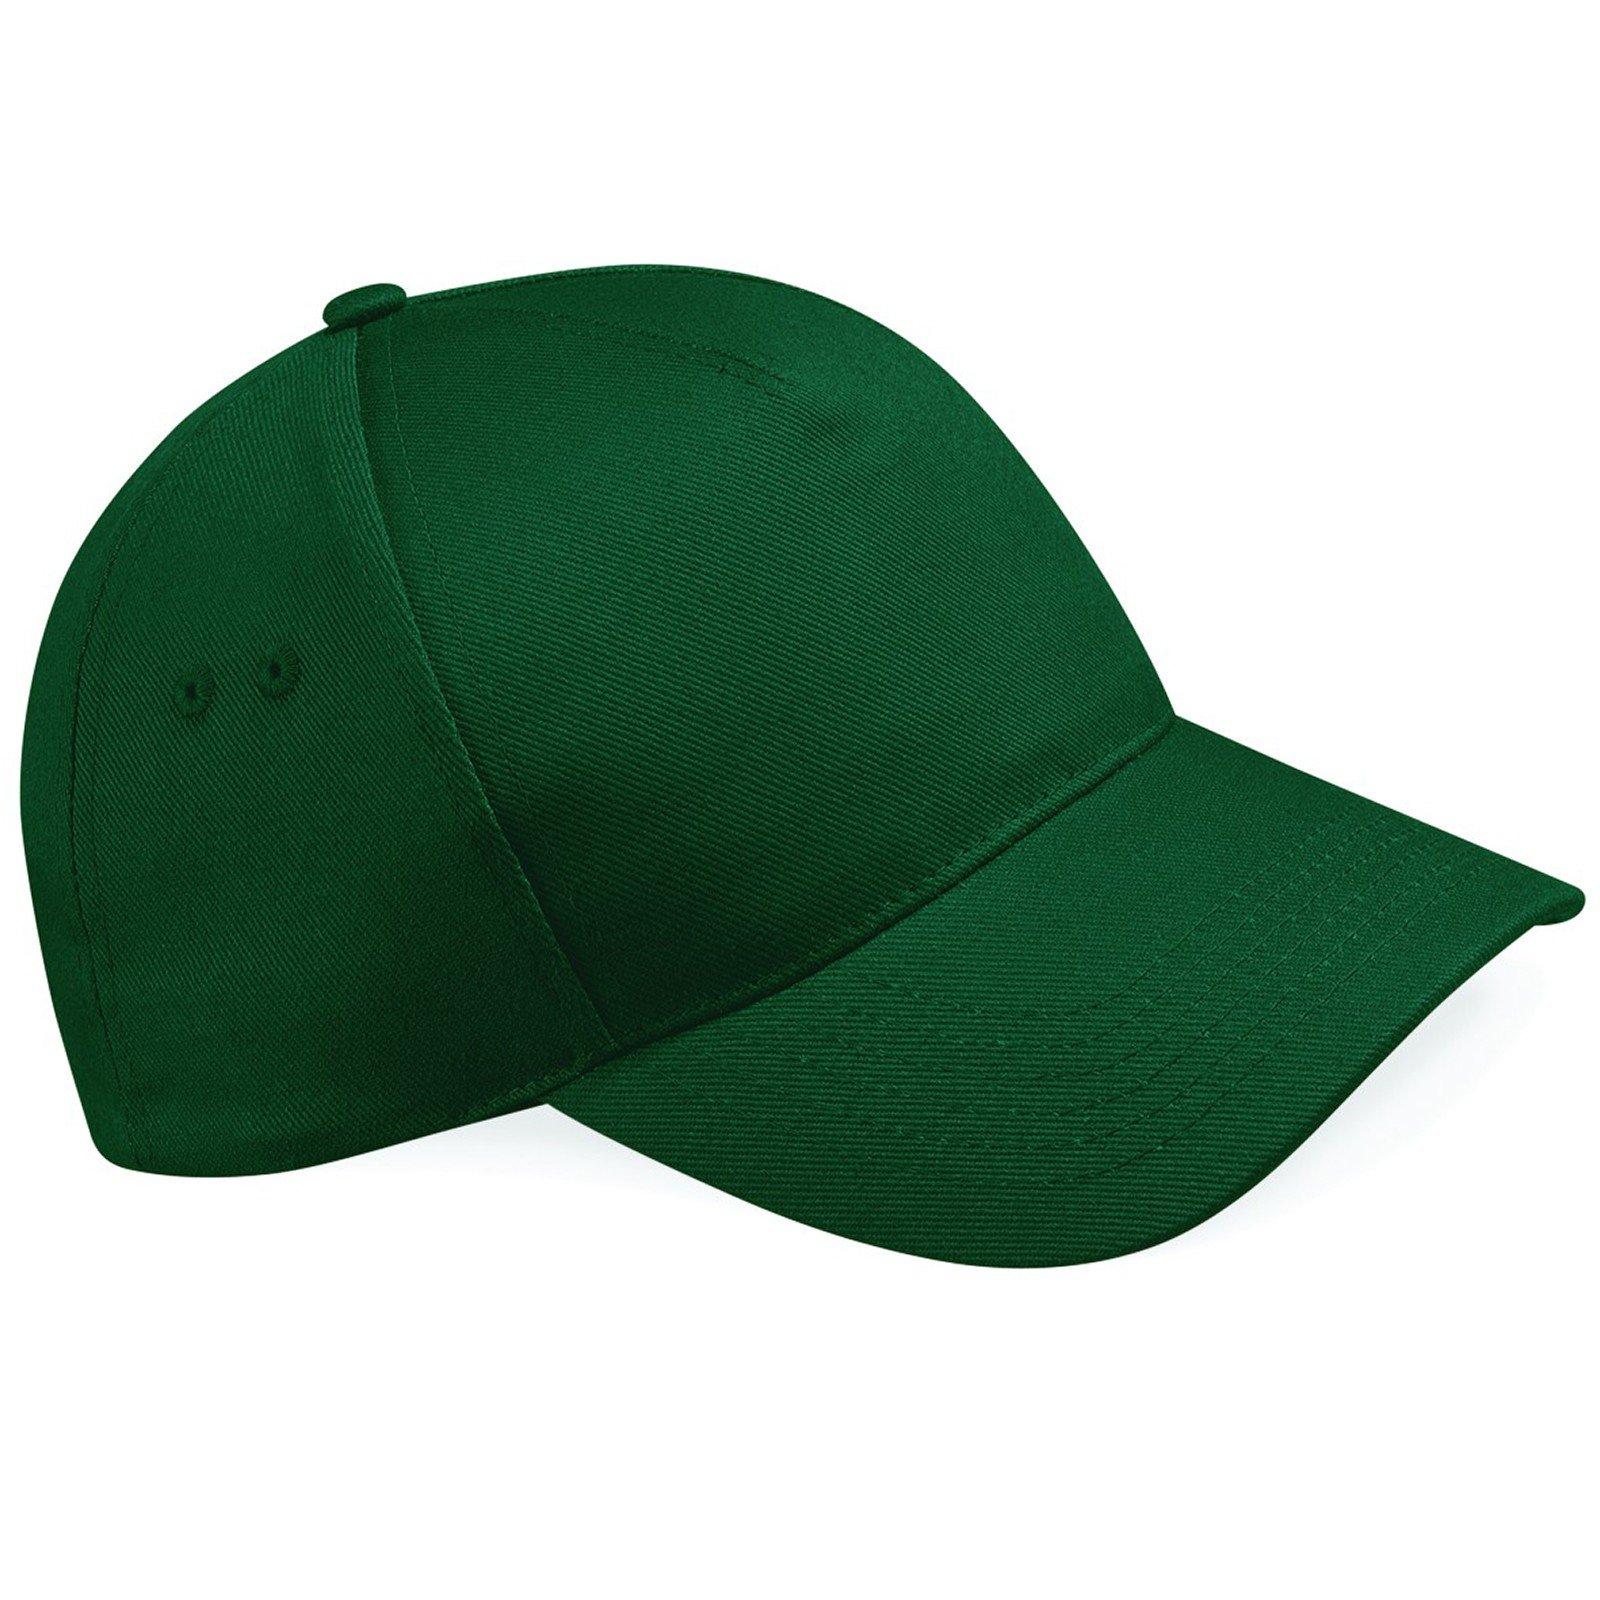 Thixendale CC Green Baseball Cap